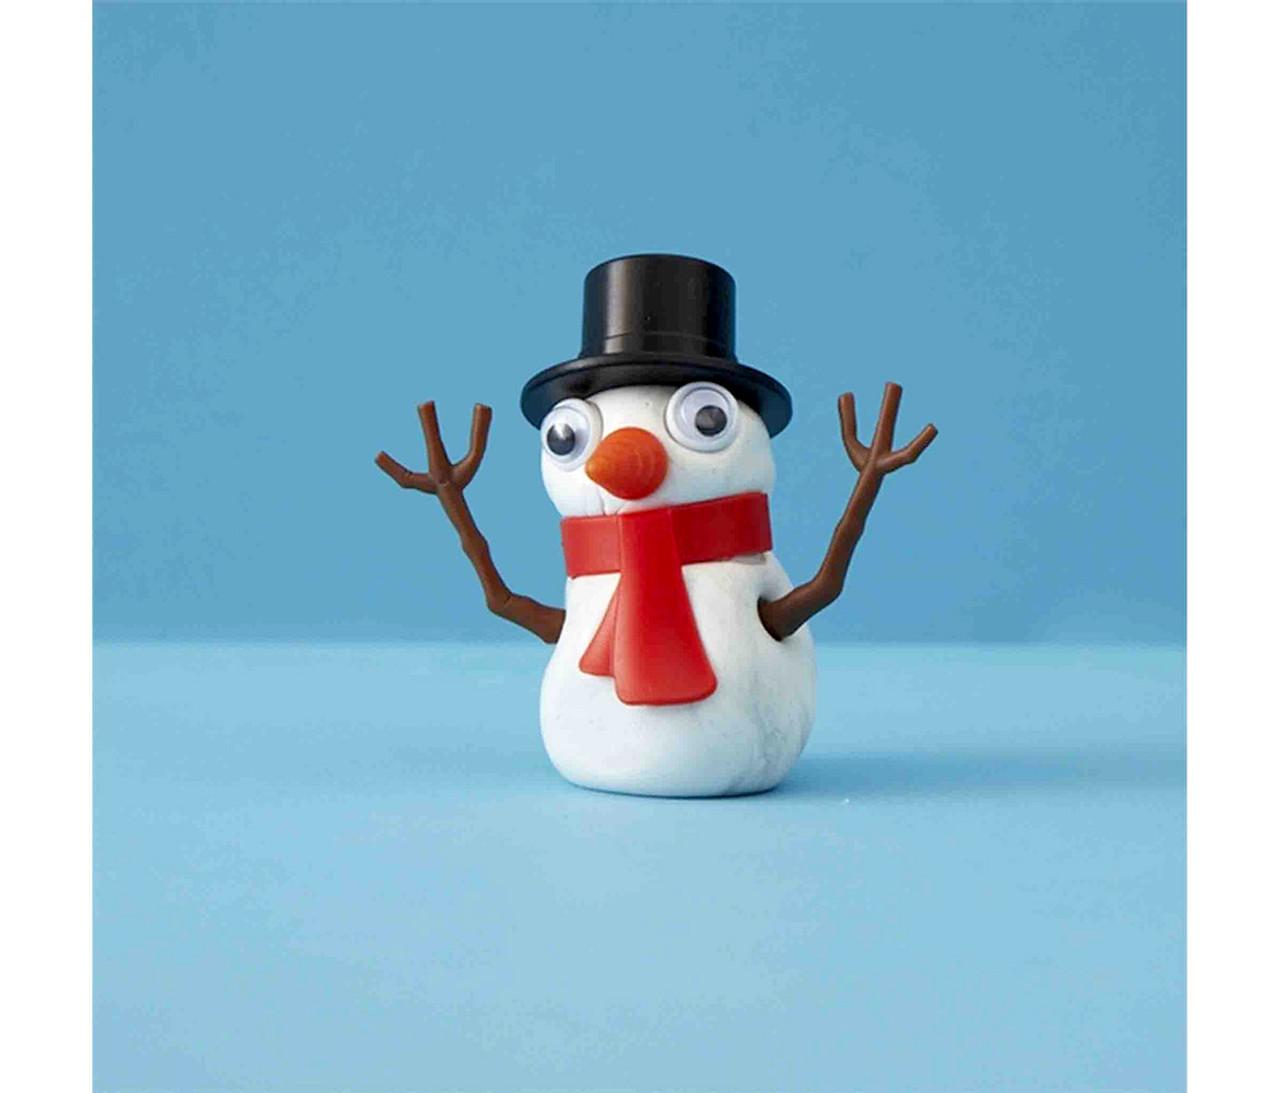 Cupcakes And Cartwheels The Original Miracle Melting Snowman Novelty